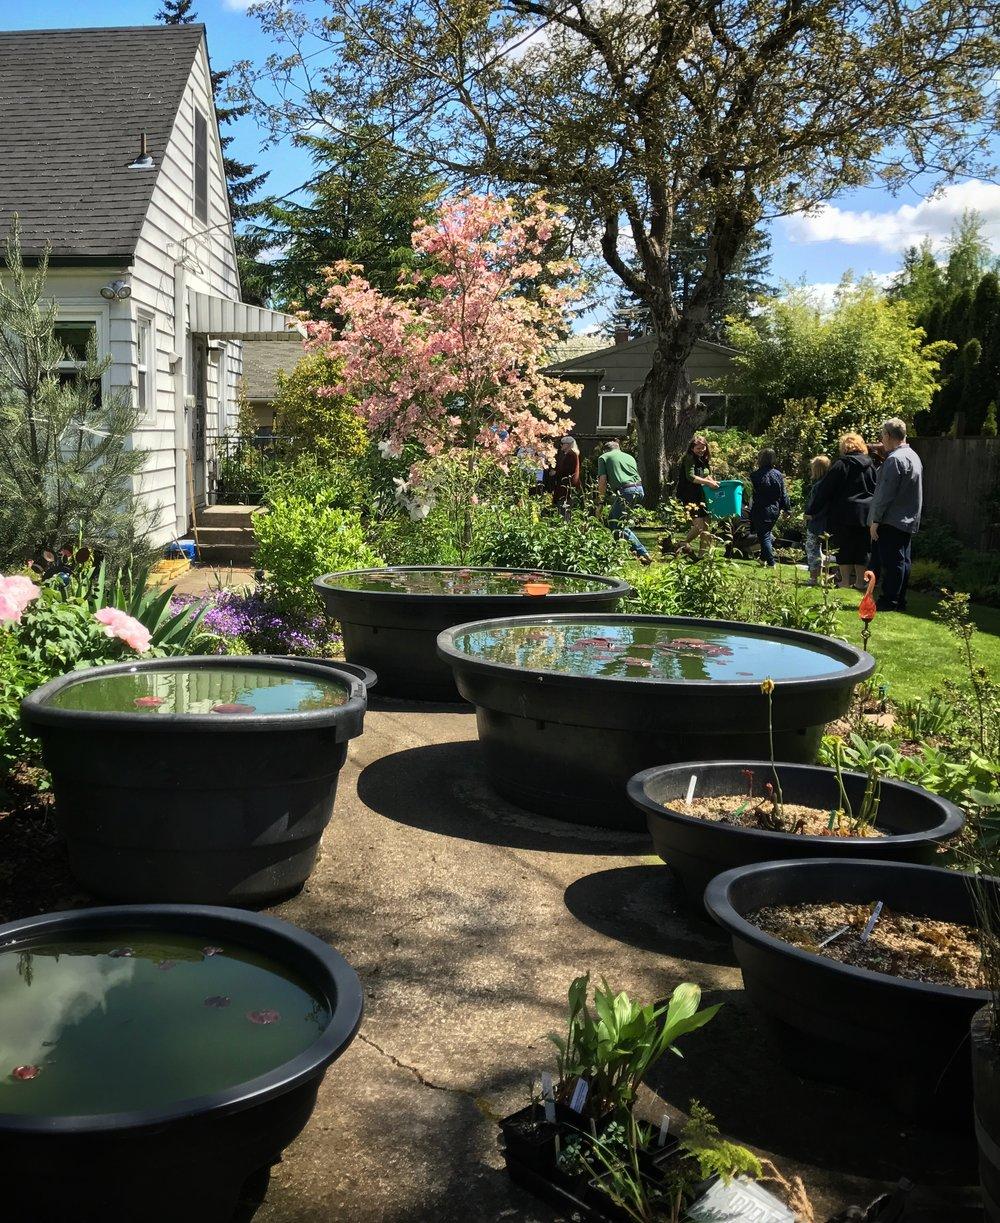 Matthew's garden